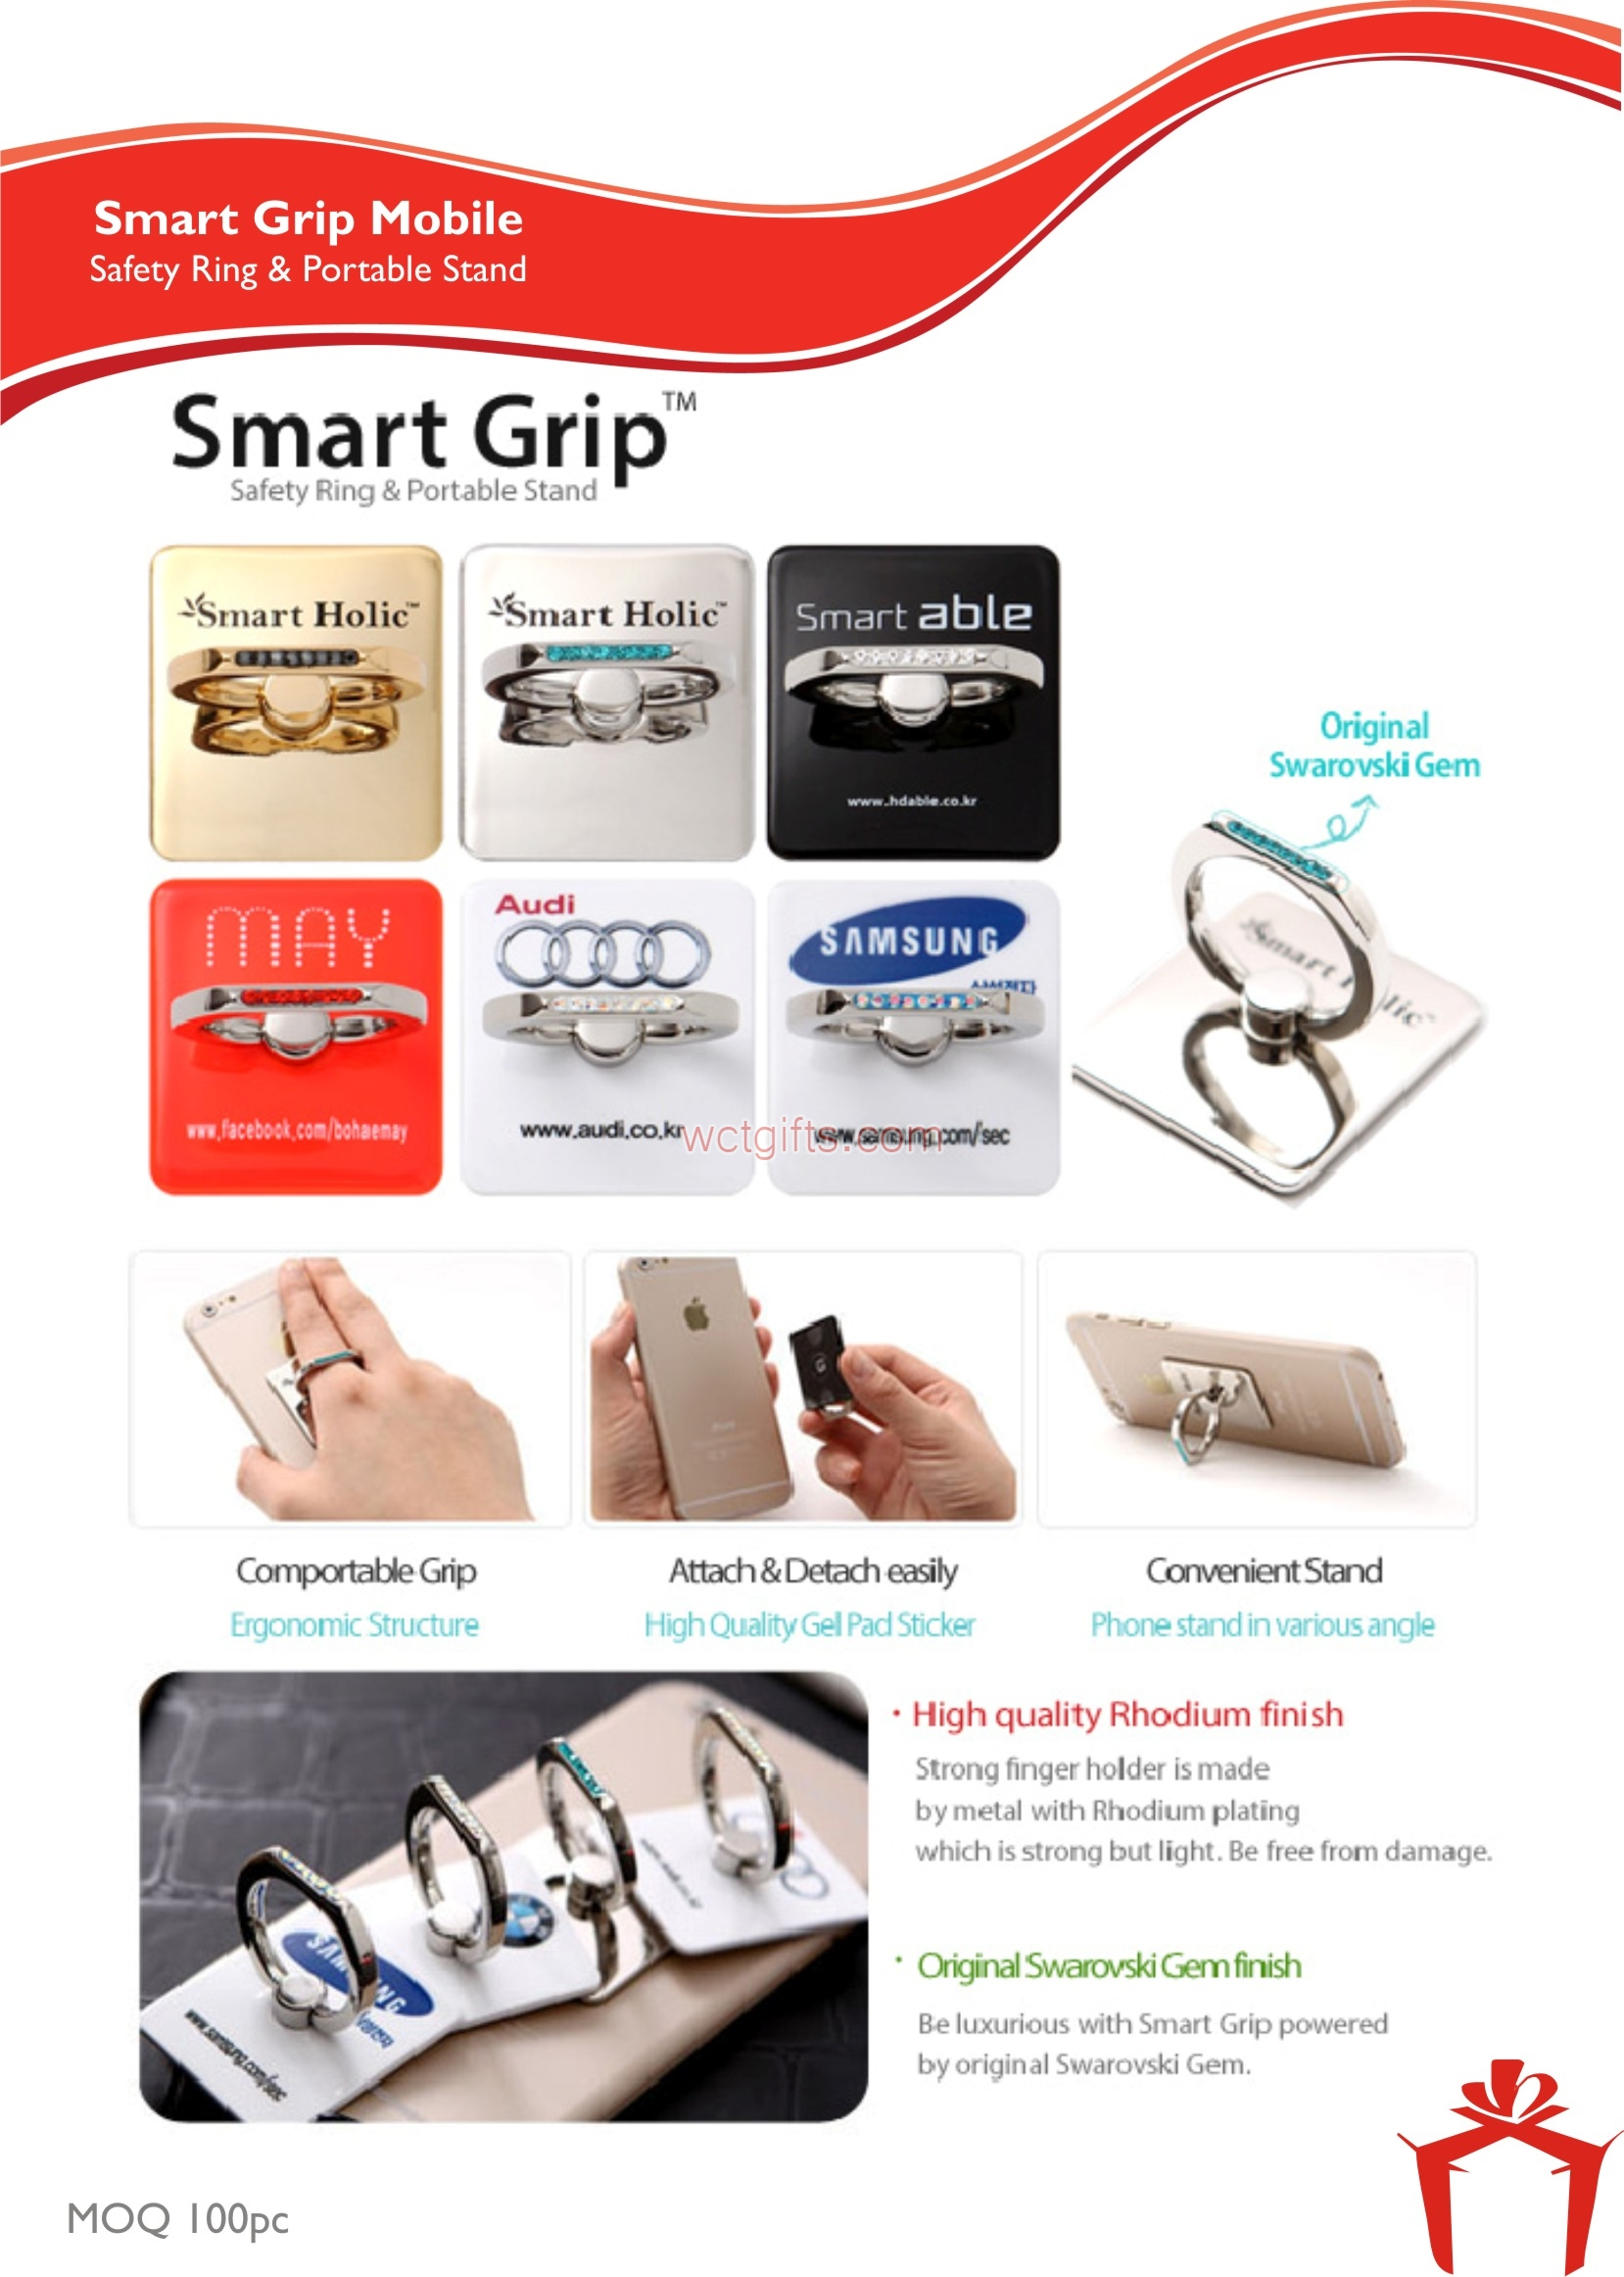 Smart Grip Mobile